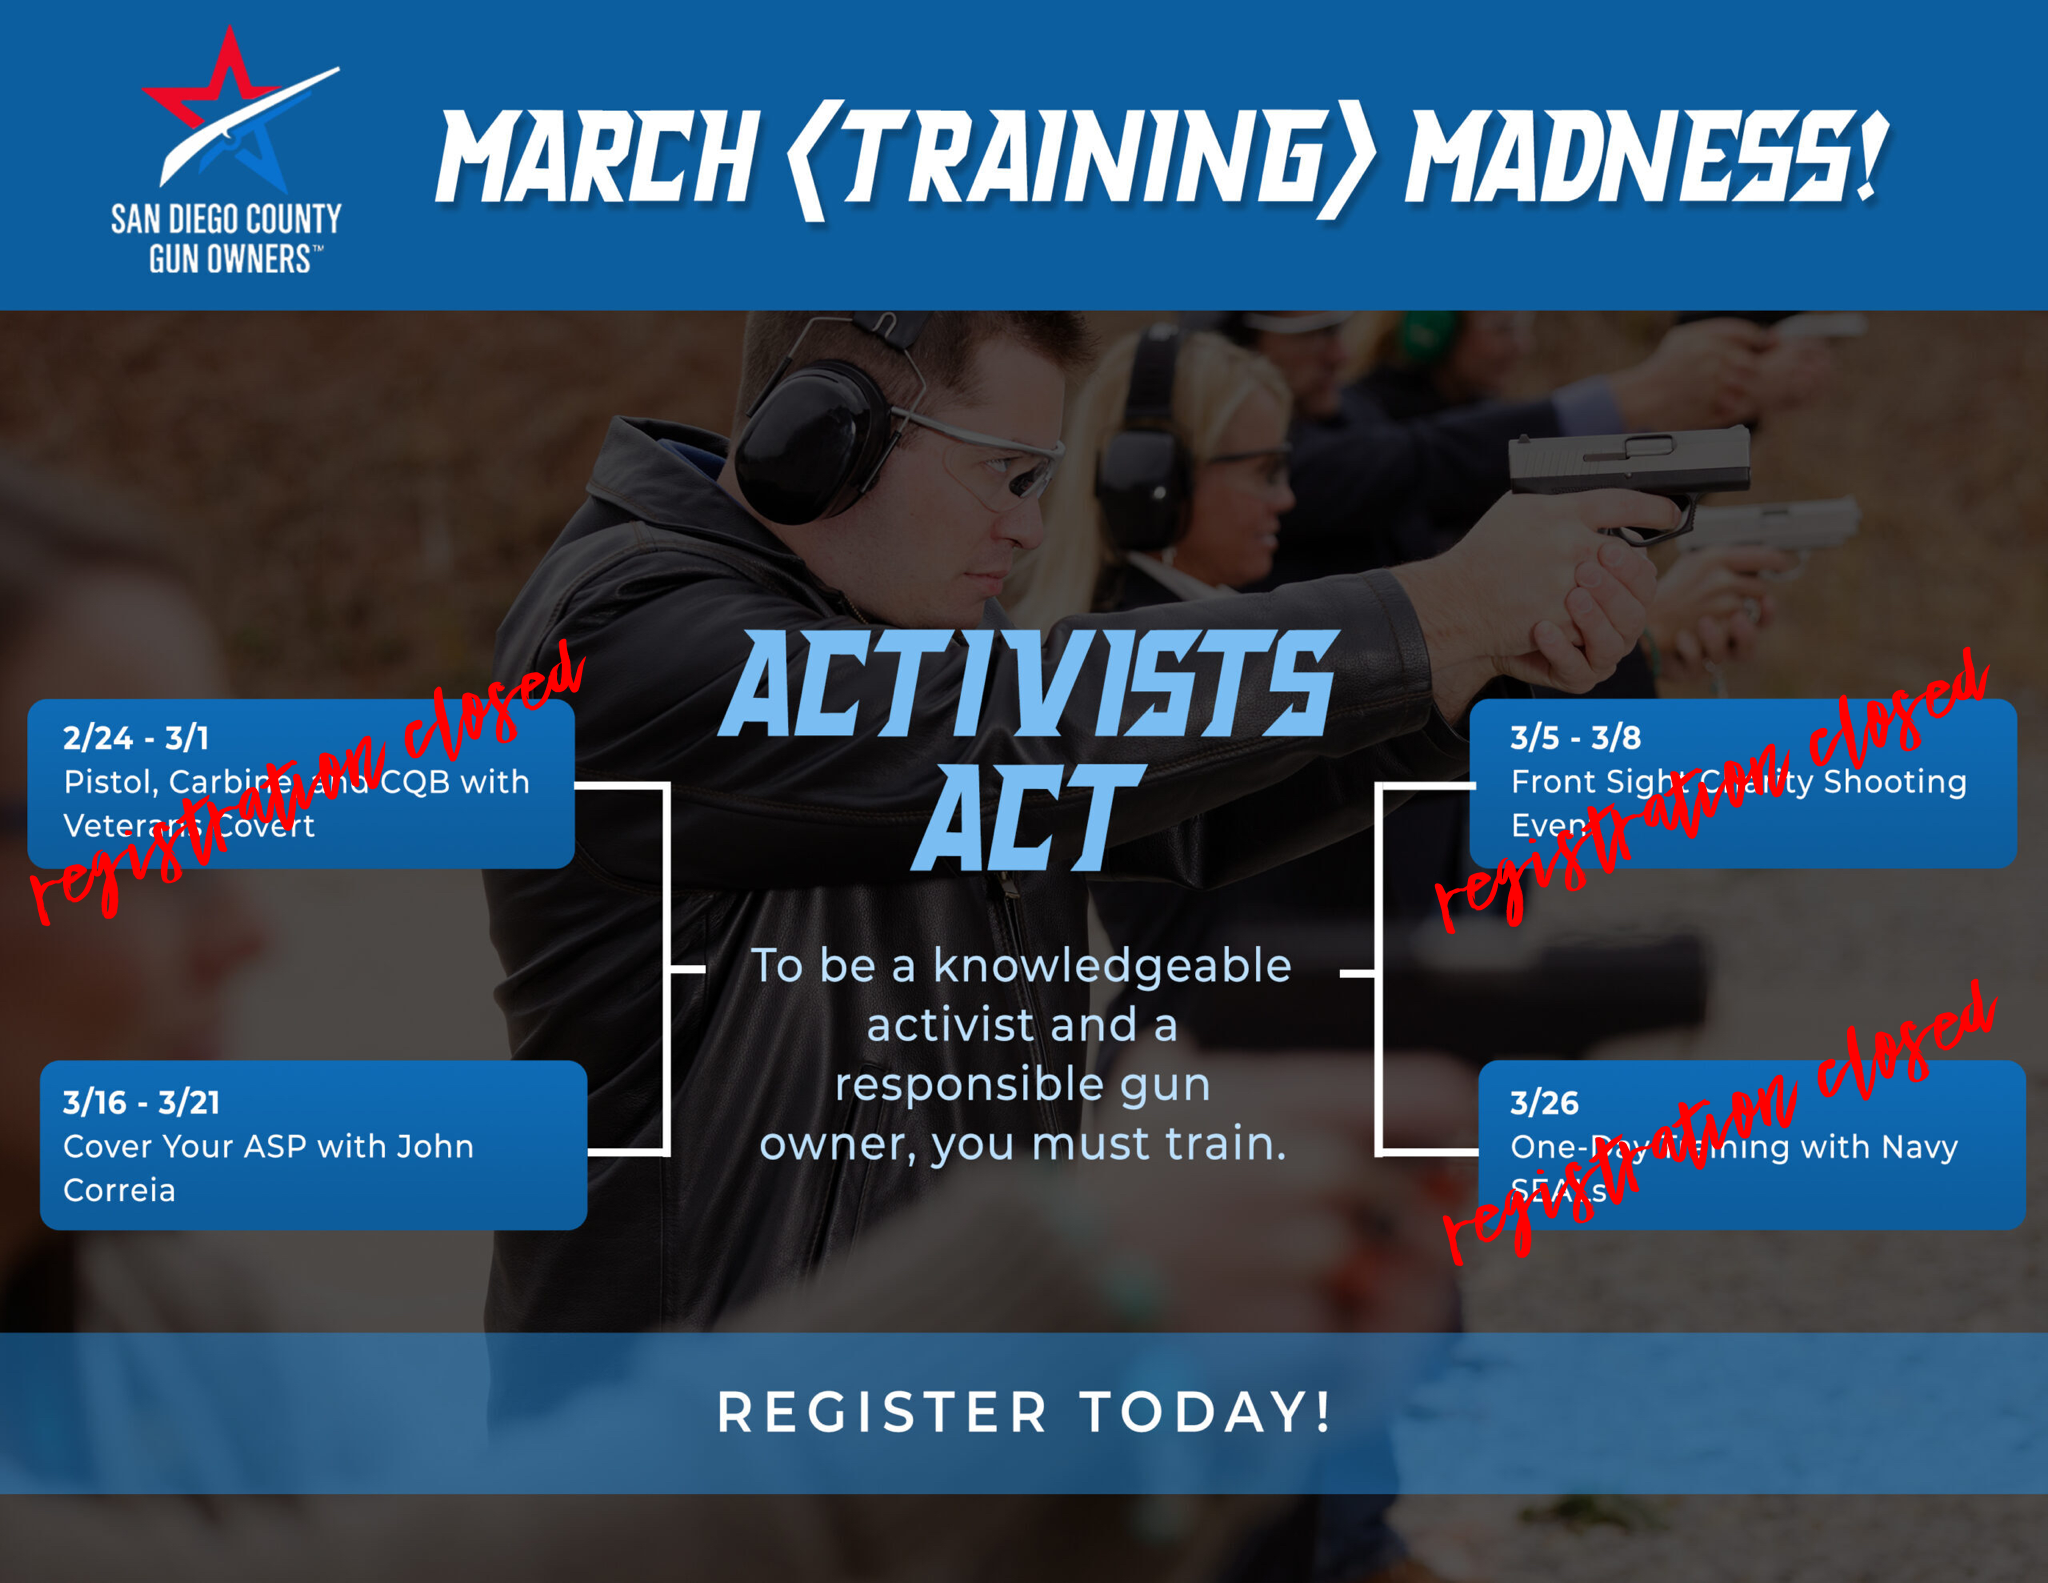 March Madness v3